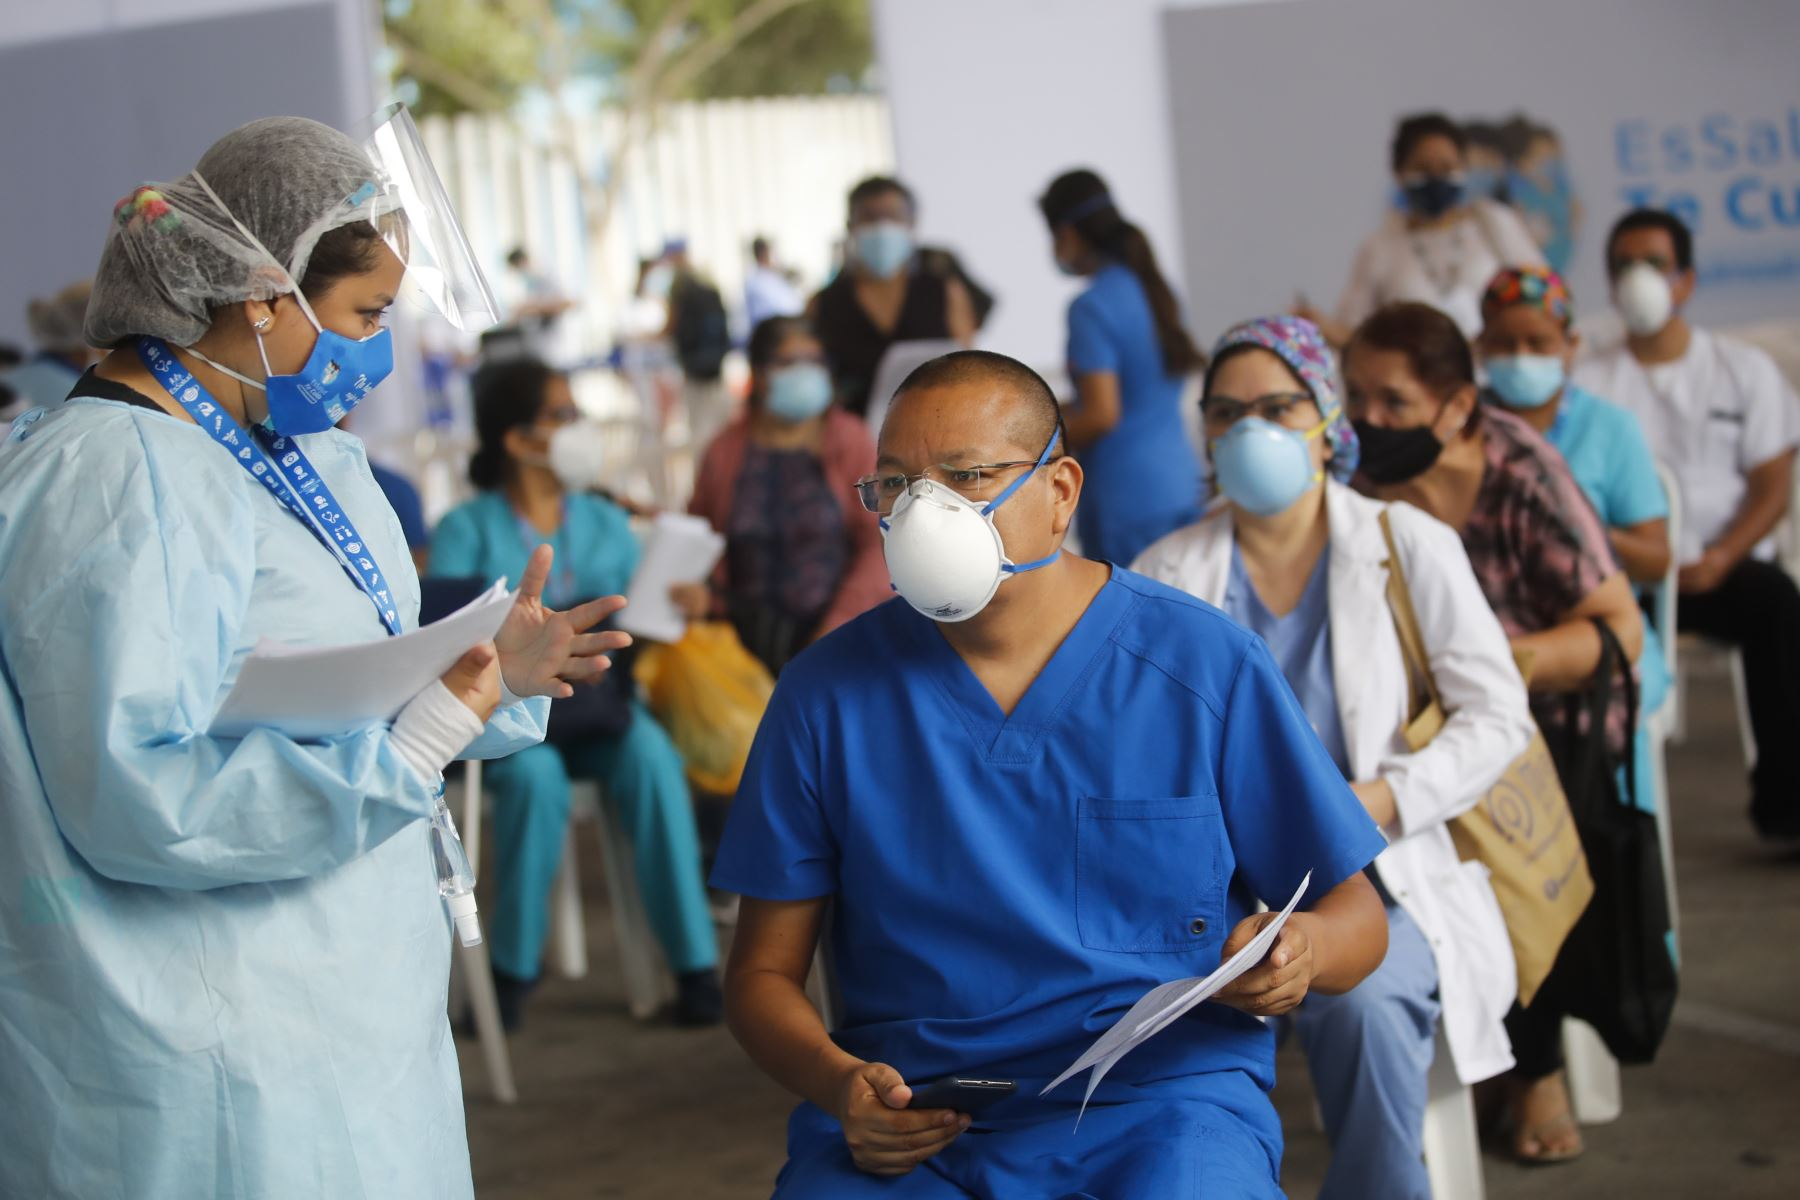 Personal médico del Hospital Edgardo Rebagliati a la espera de recibir la vacuna contra el Covid-19.  Foto:ANDINA / Juan Carlos Guzmán Negrini